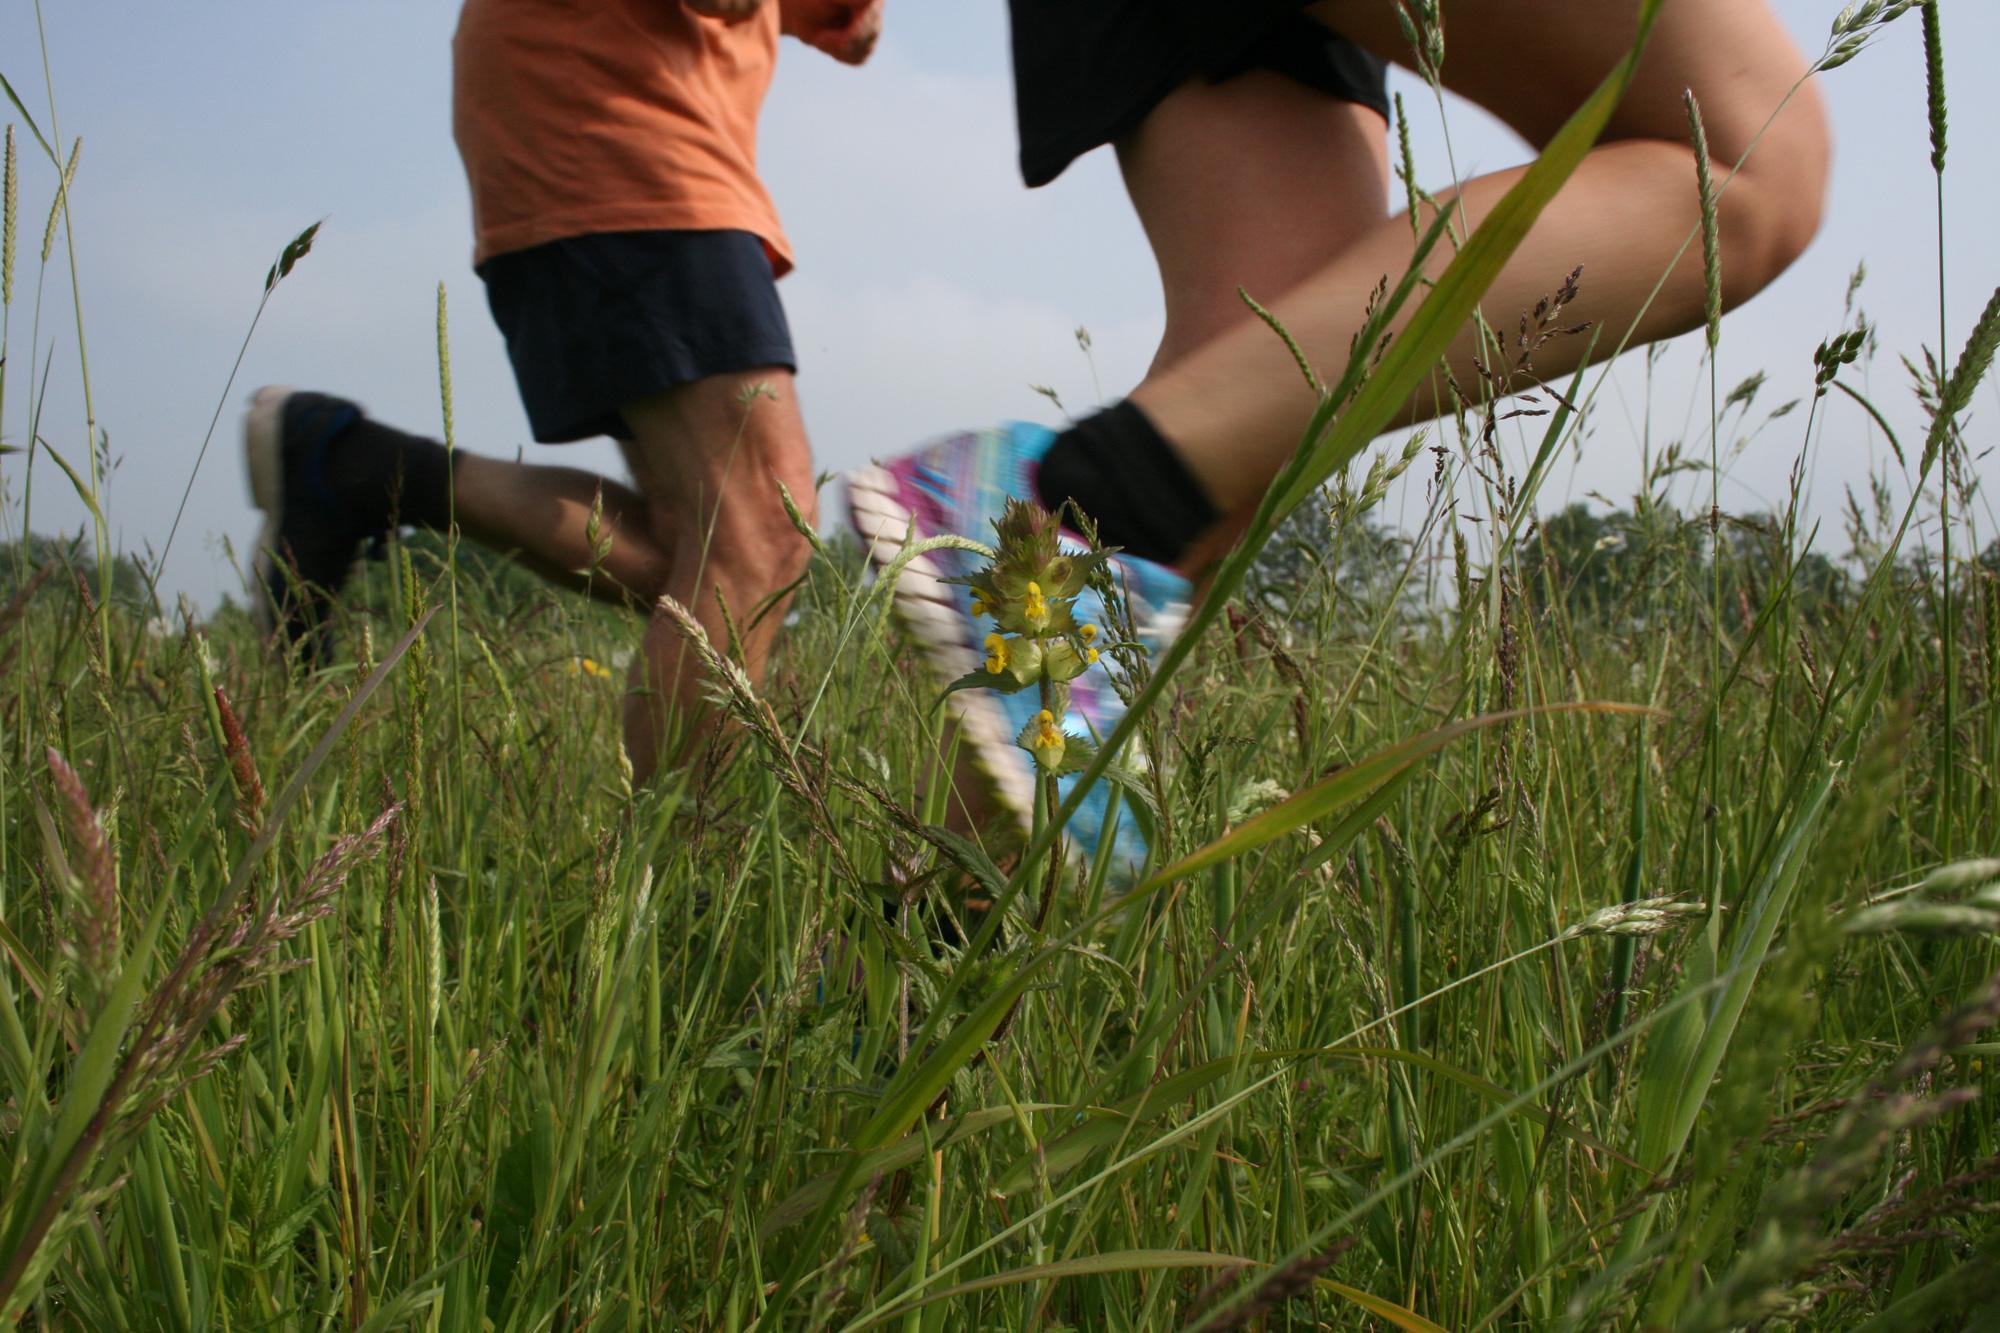 Runners' legs going past a yellow flower in long grass